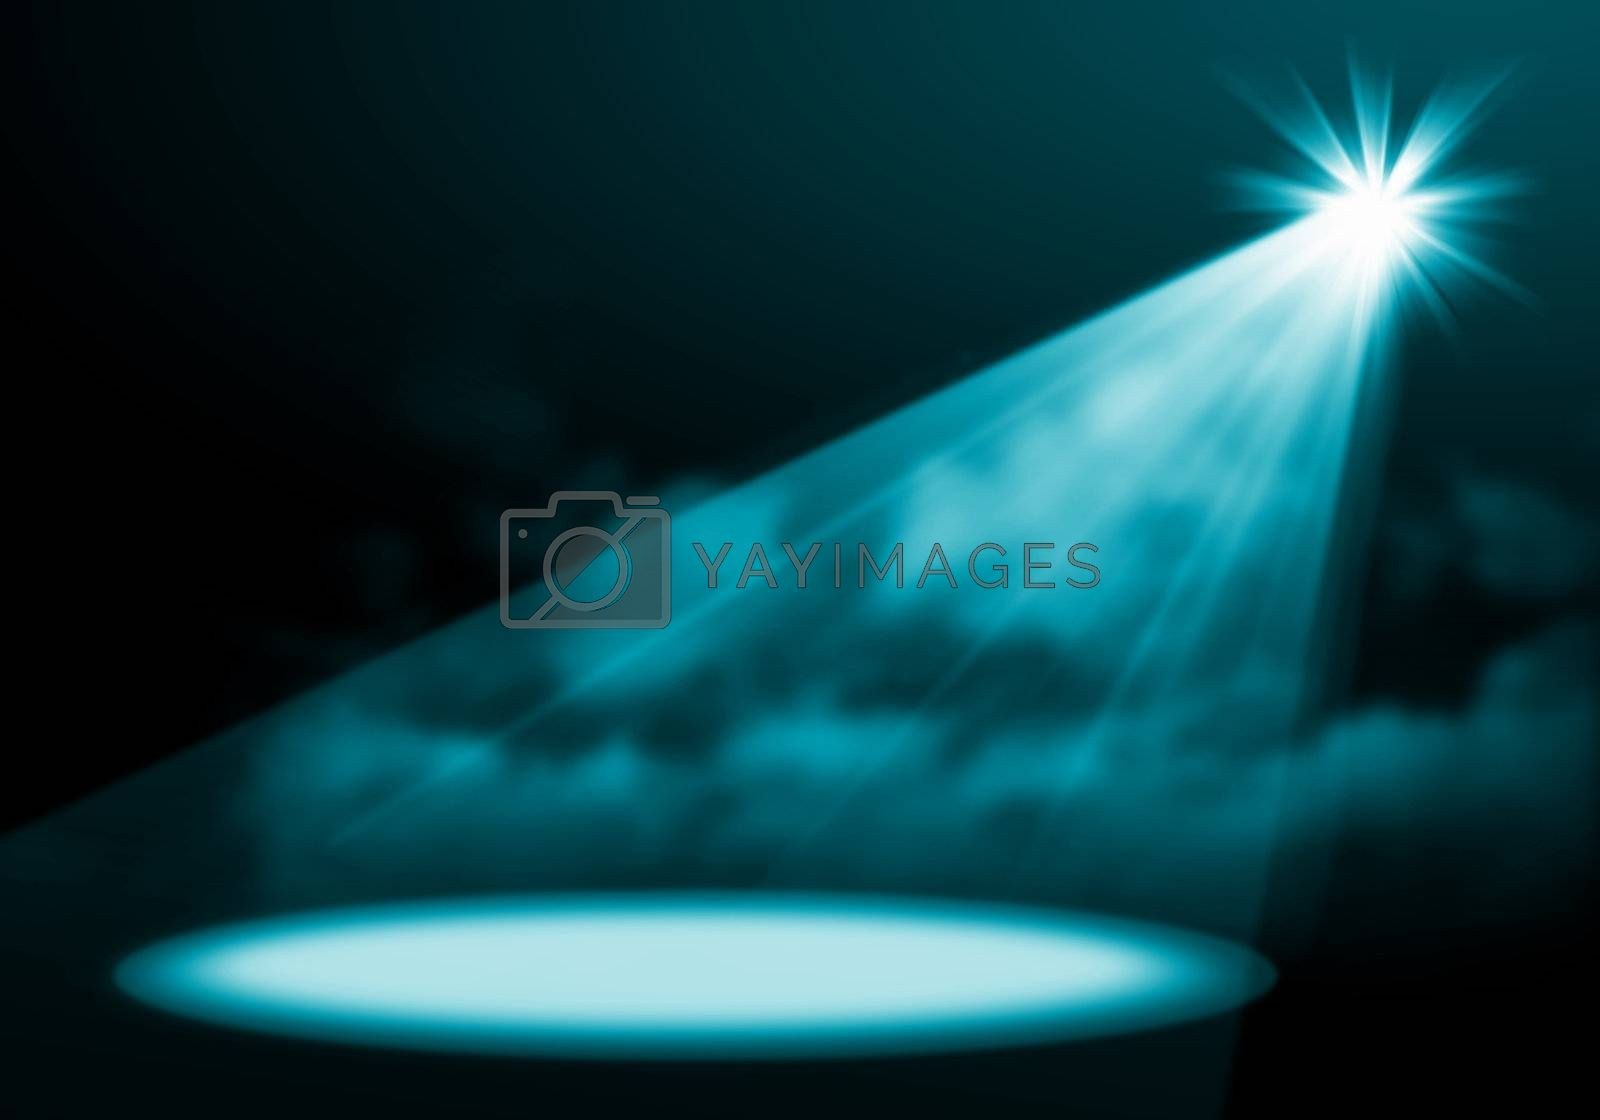 Stage lights. illustration. by Sergey Nivens